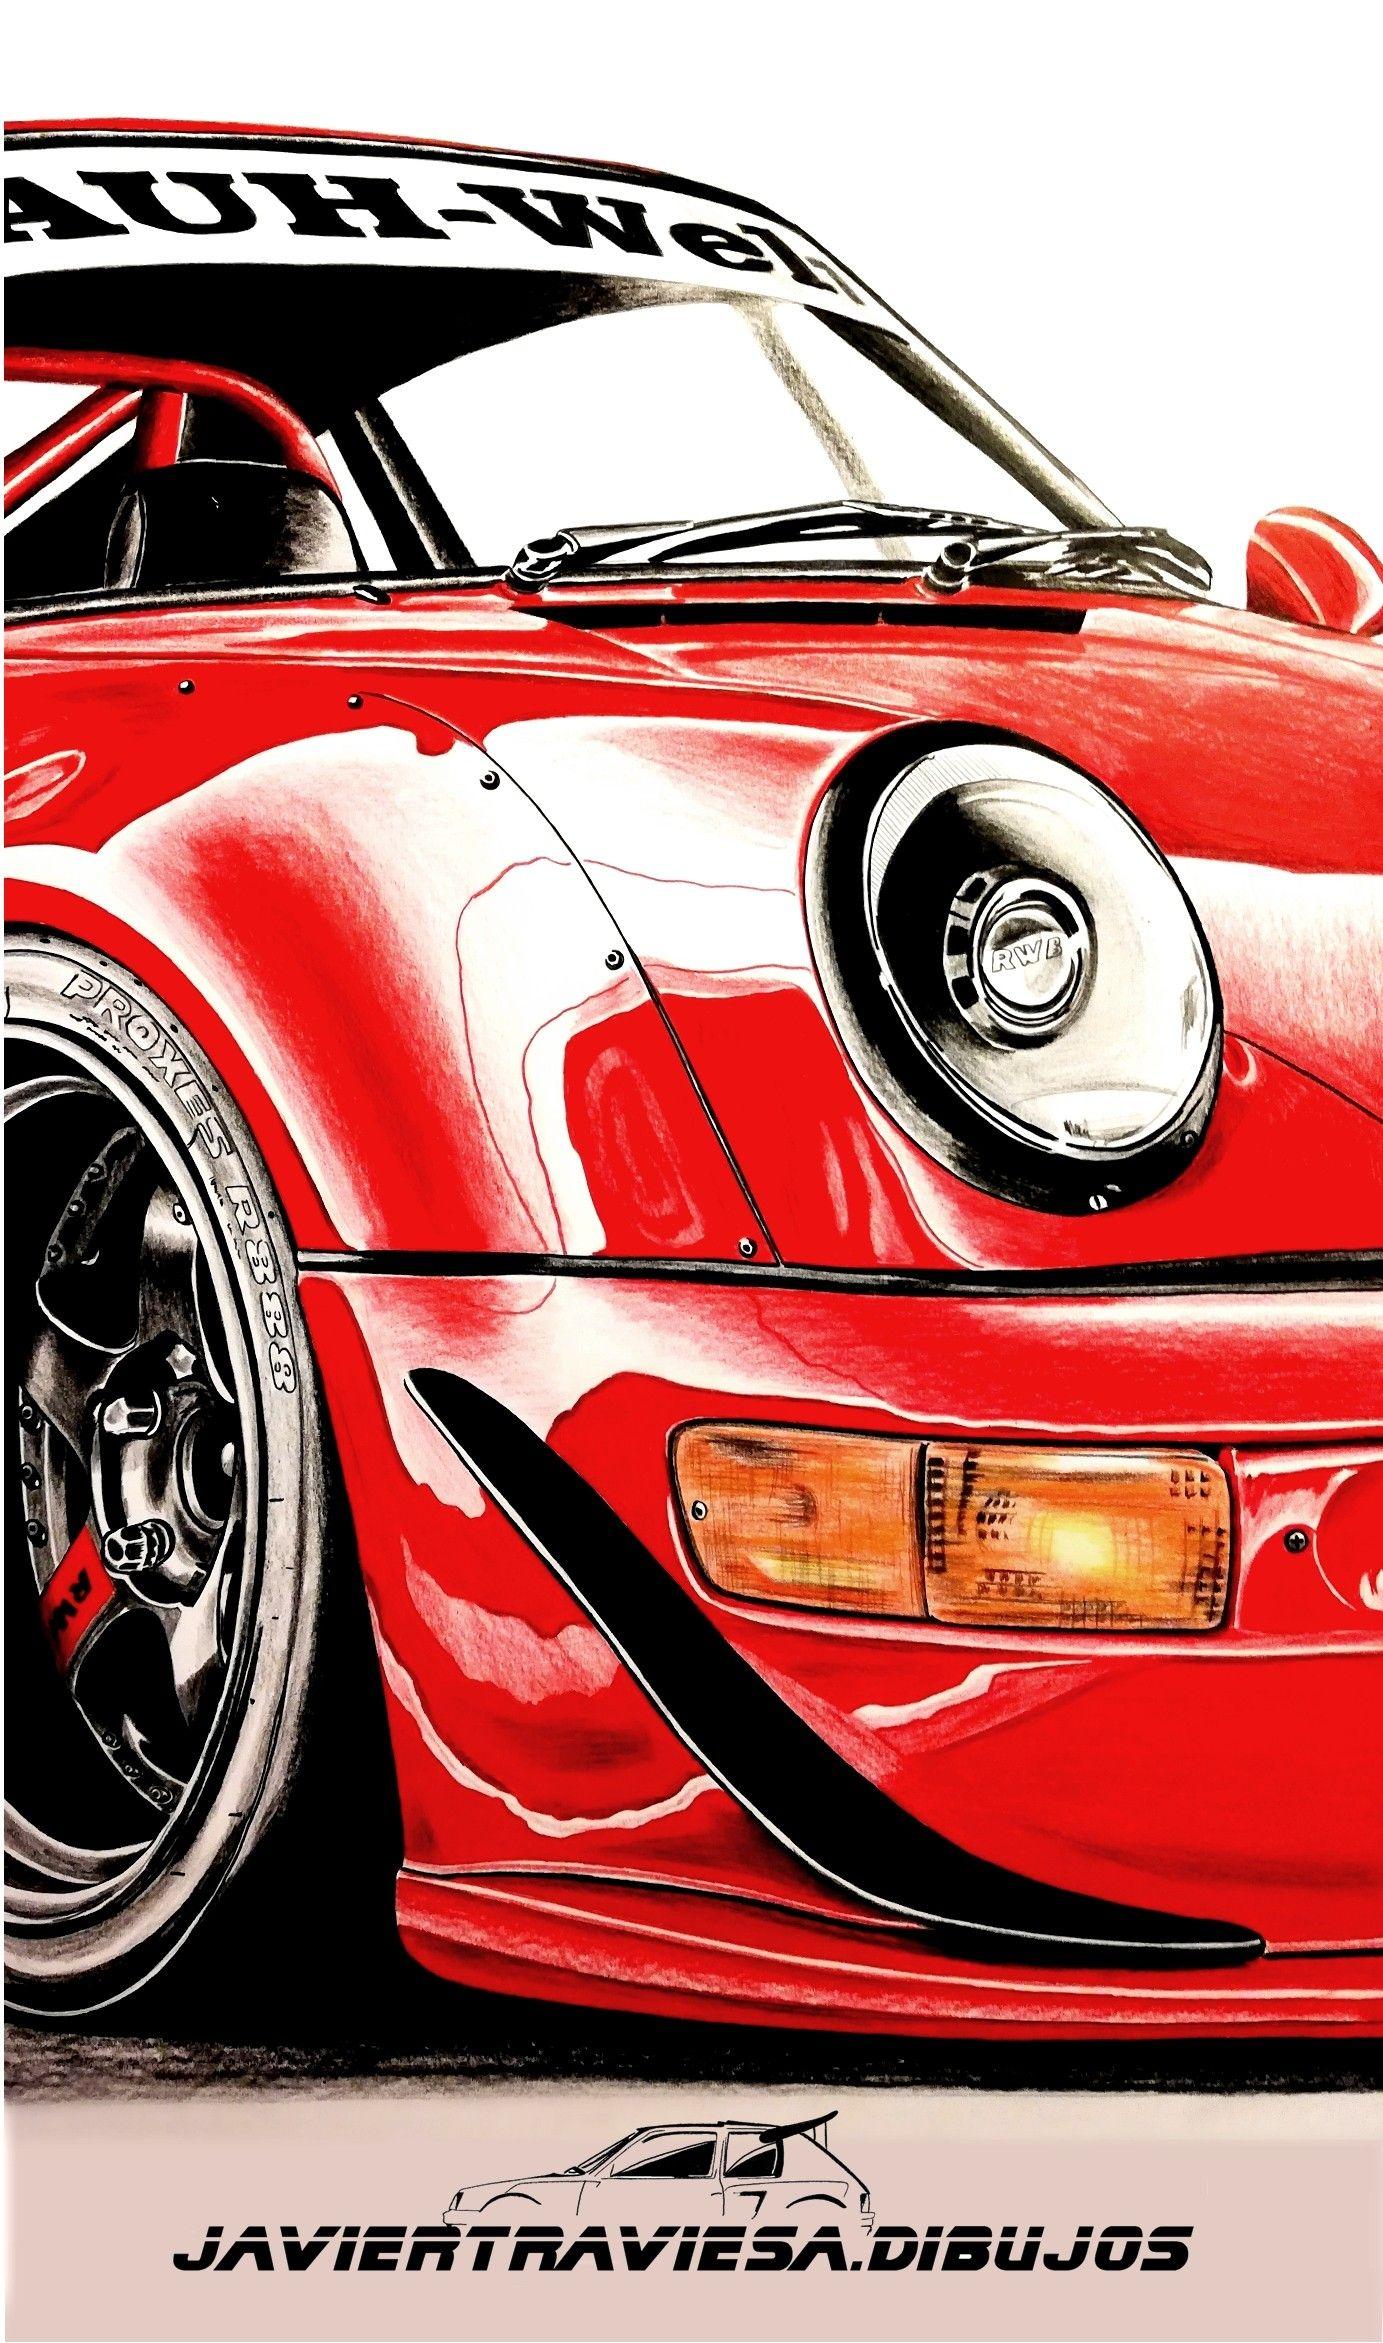 Mobile Car Painting : mobile, painting, Chetan, Mistry, Drawings,, Artwork,, Painting